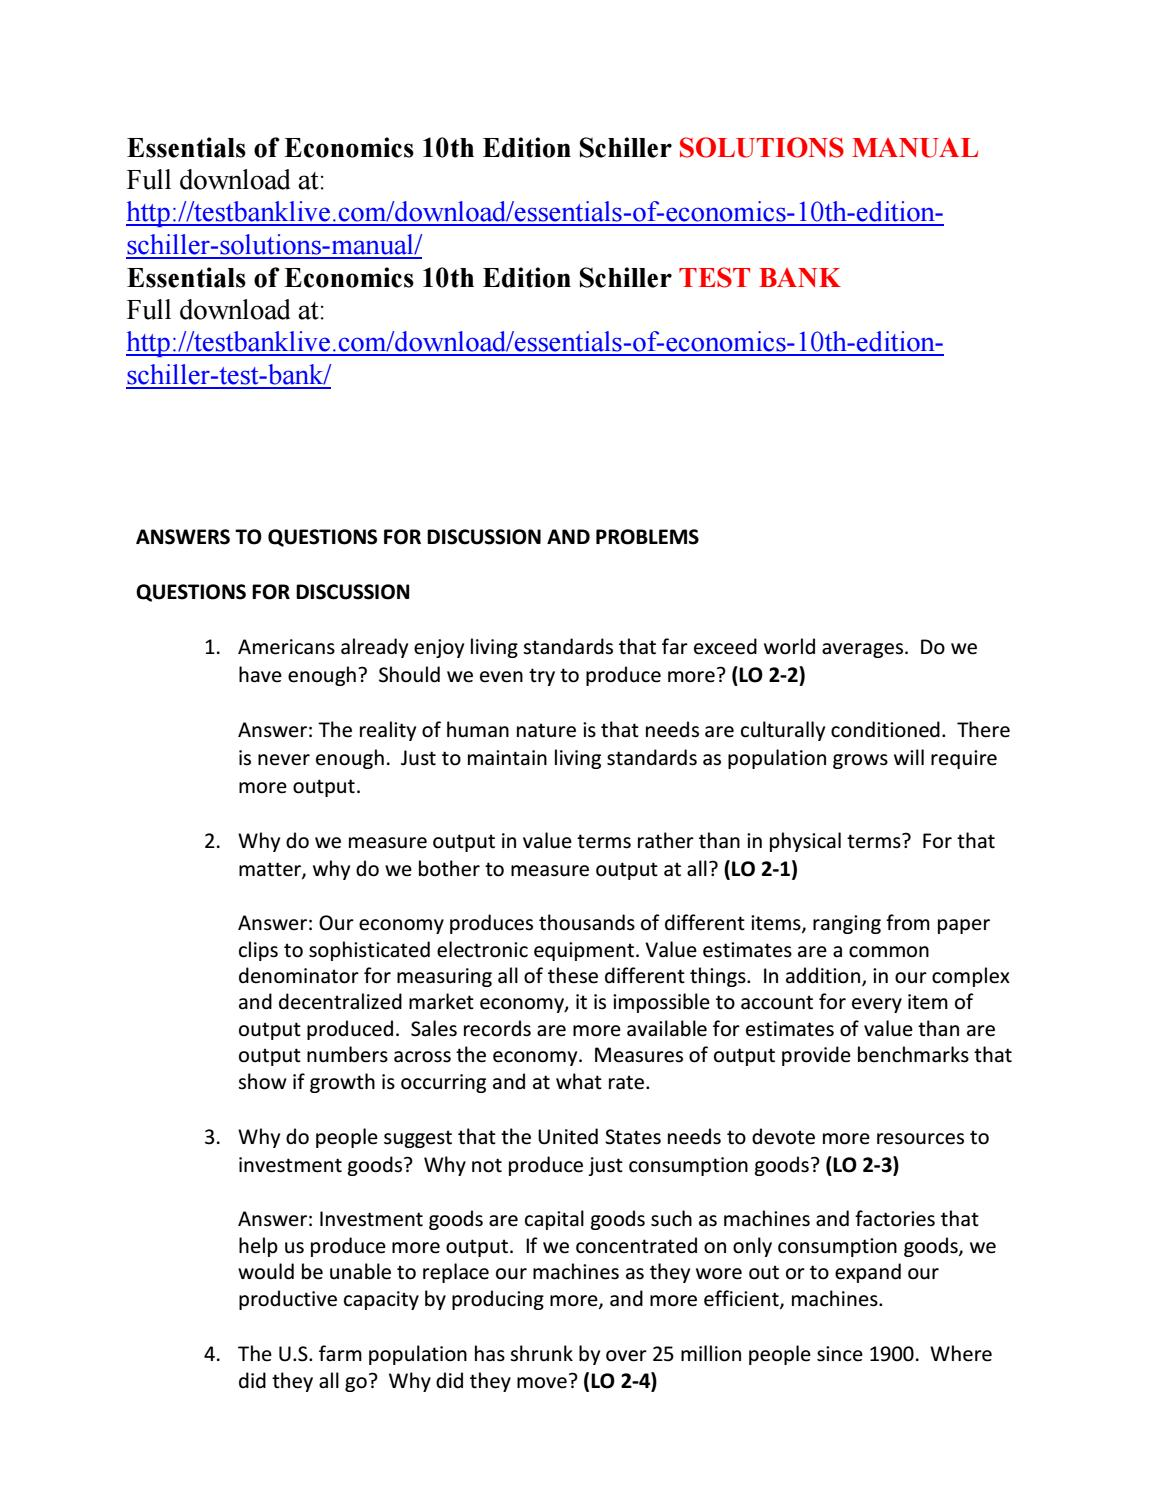 Essentials of economics 10th edition schiller solutions manual by  Aurora1234 - issuu